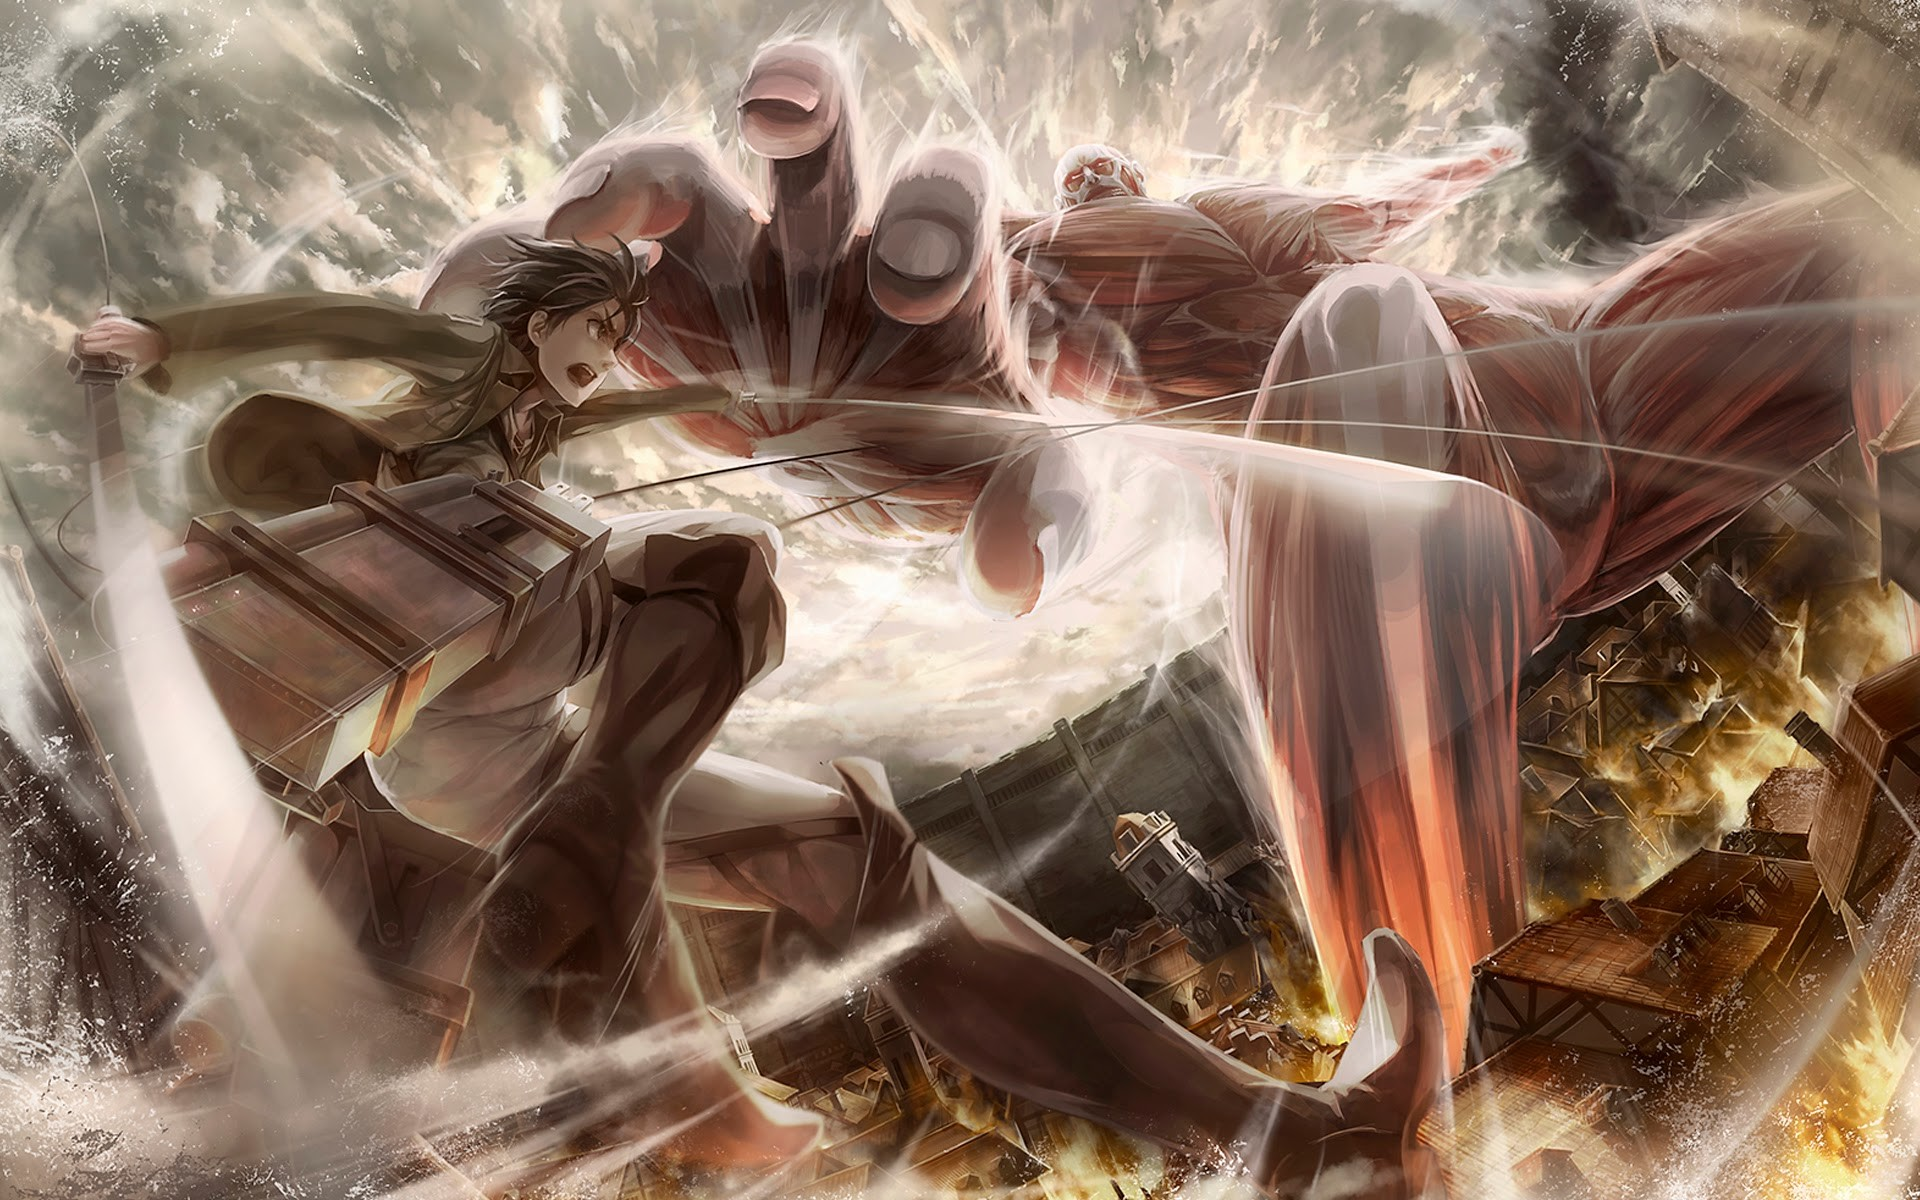 colossal-titan-vs-eren-jaeger-attack-on-titan-hd-wallpaper-1920×1200.jpg  (1920×1200) | Shingeki No Kyojin | Pinterest | Anime fan art and Anime